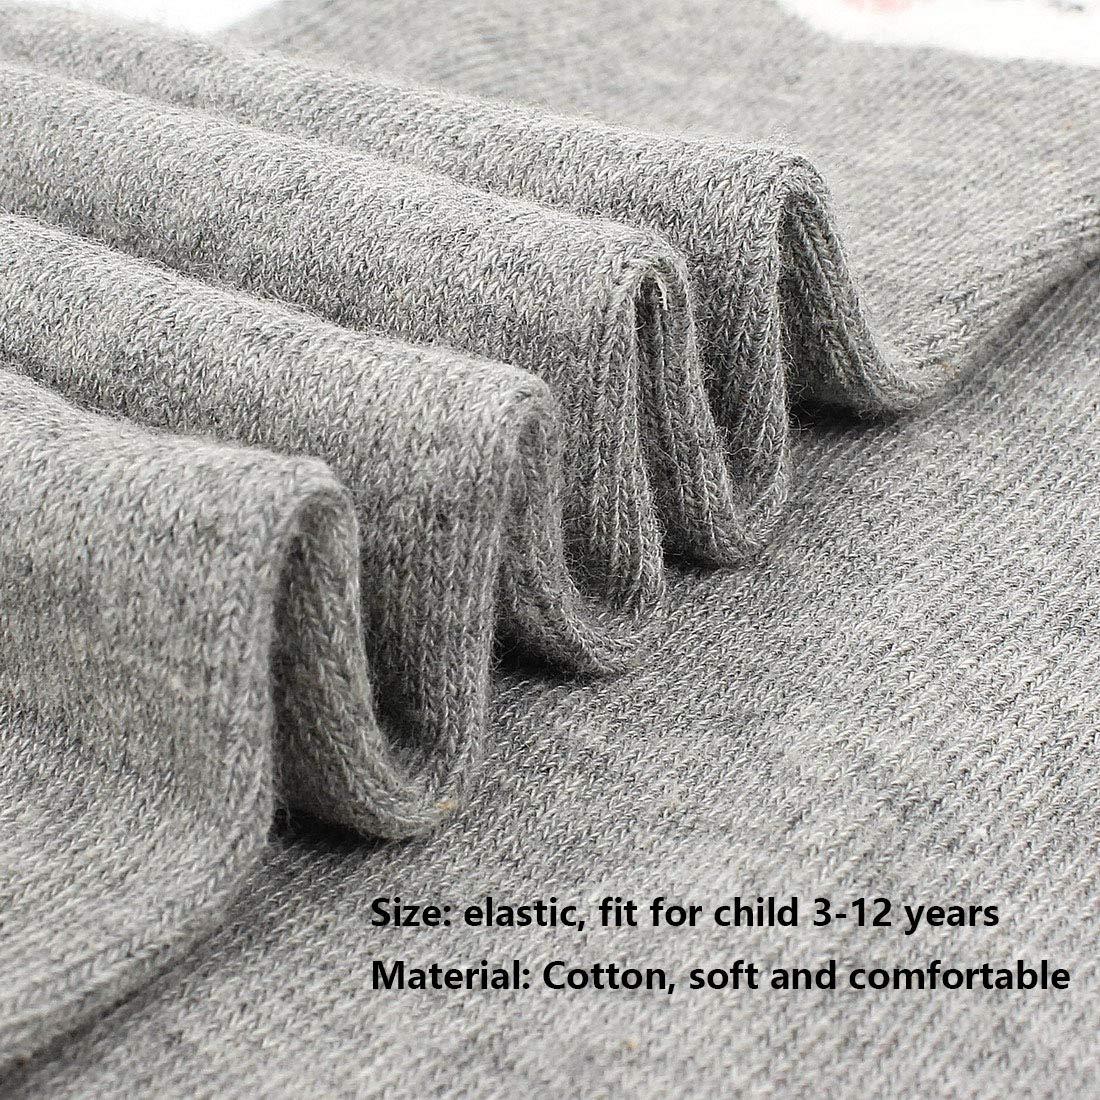 Menghao 6 Pairs Knee Socks Girl for 5-12Years Old-Summer Spring Socks for Kids Animal Cat Fox Bear Cotton Stockings